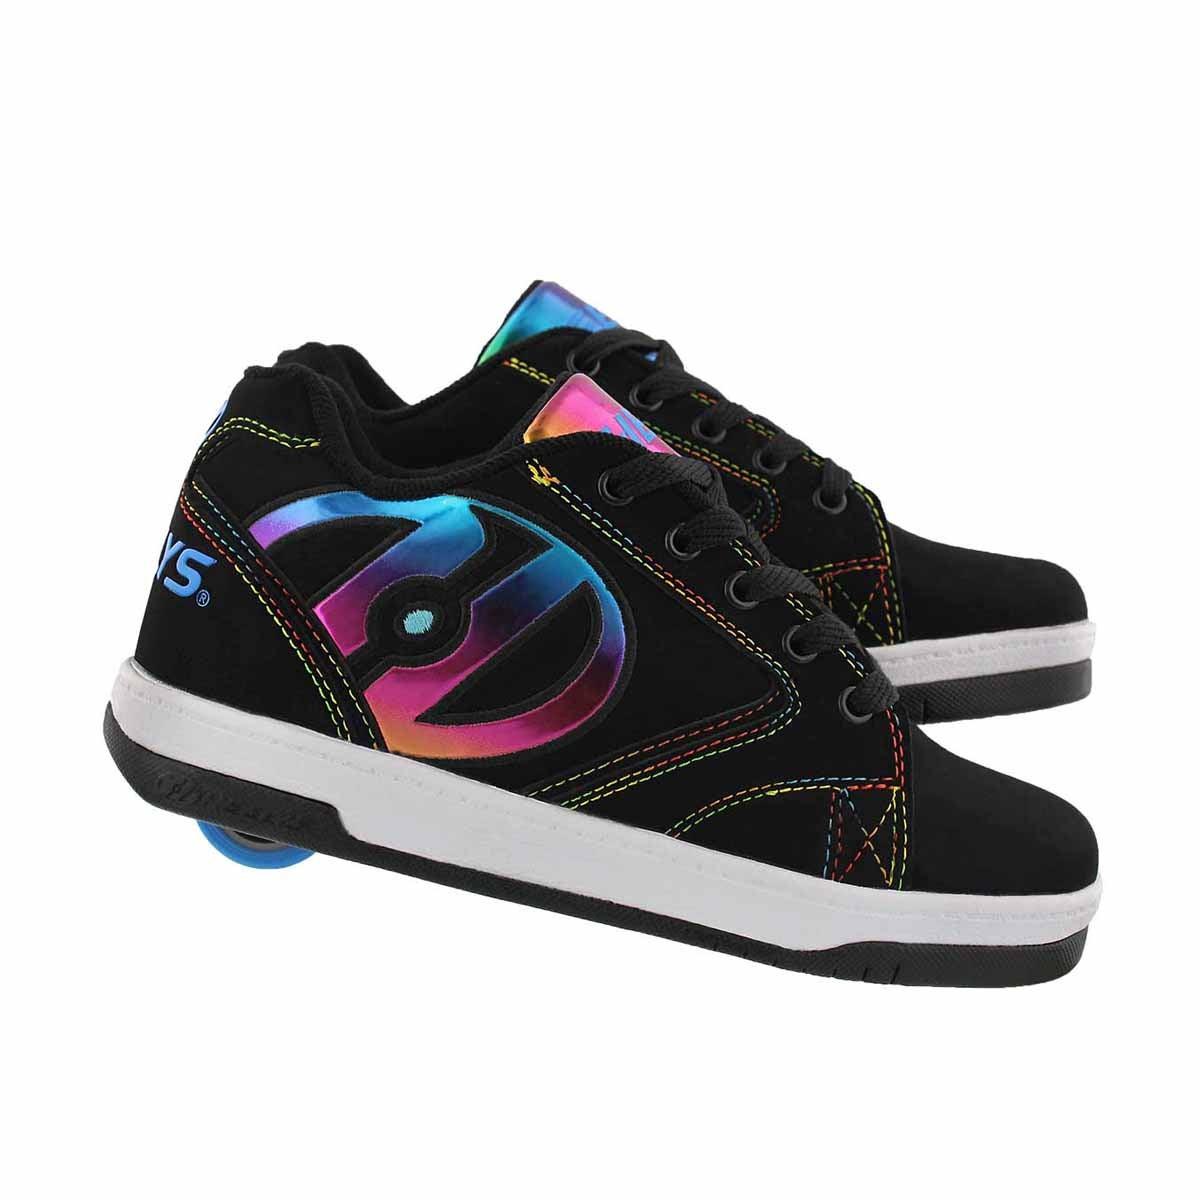 Grls Propel 2.0 bk/rainbow skate sneaker